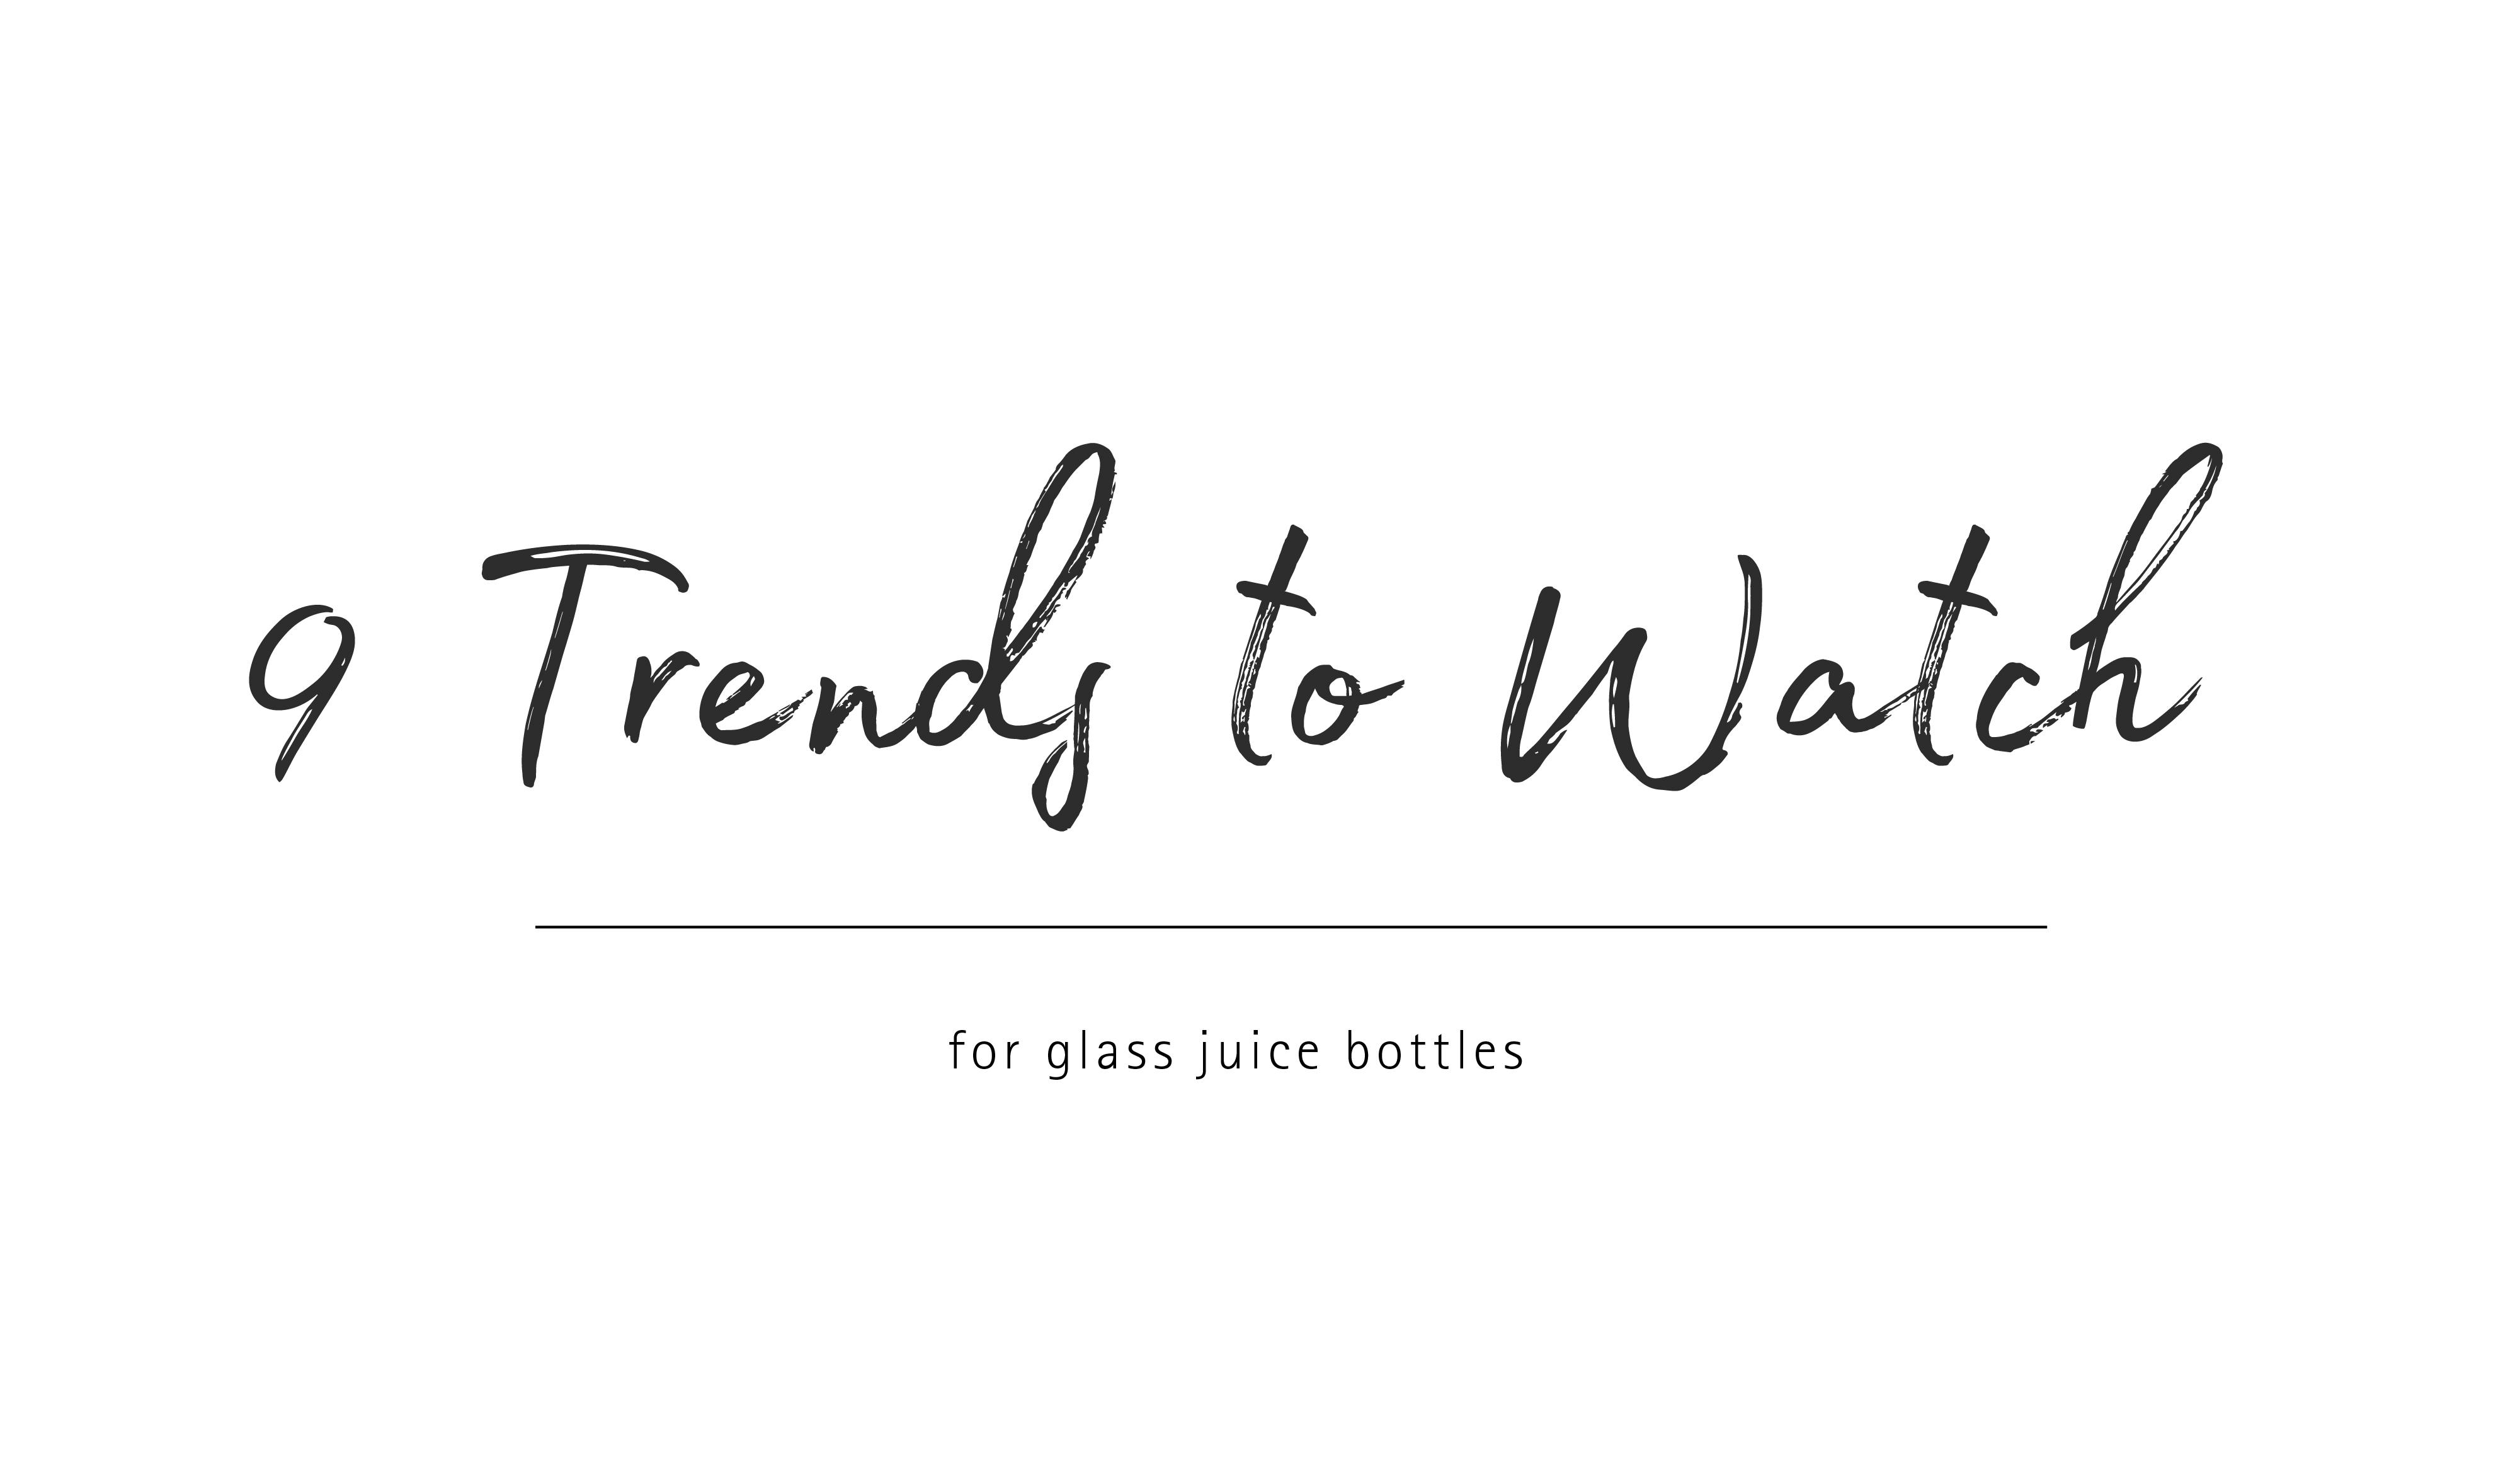 9 Branding Trends We Love for Glass Juice Bottles